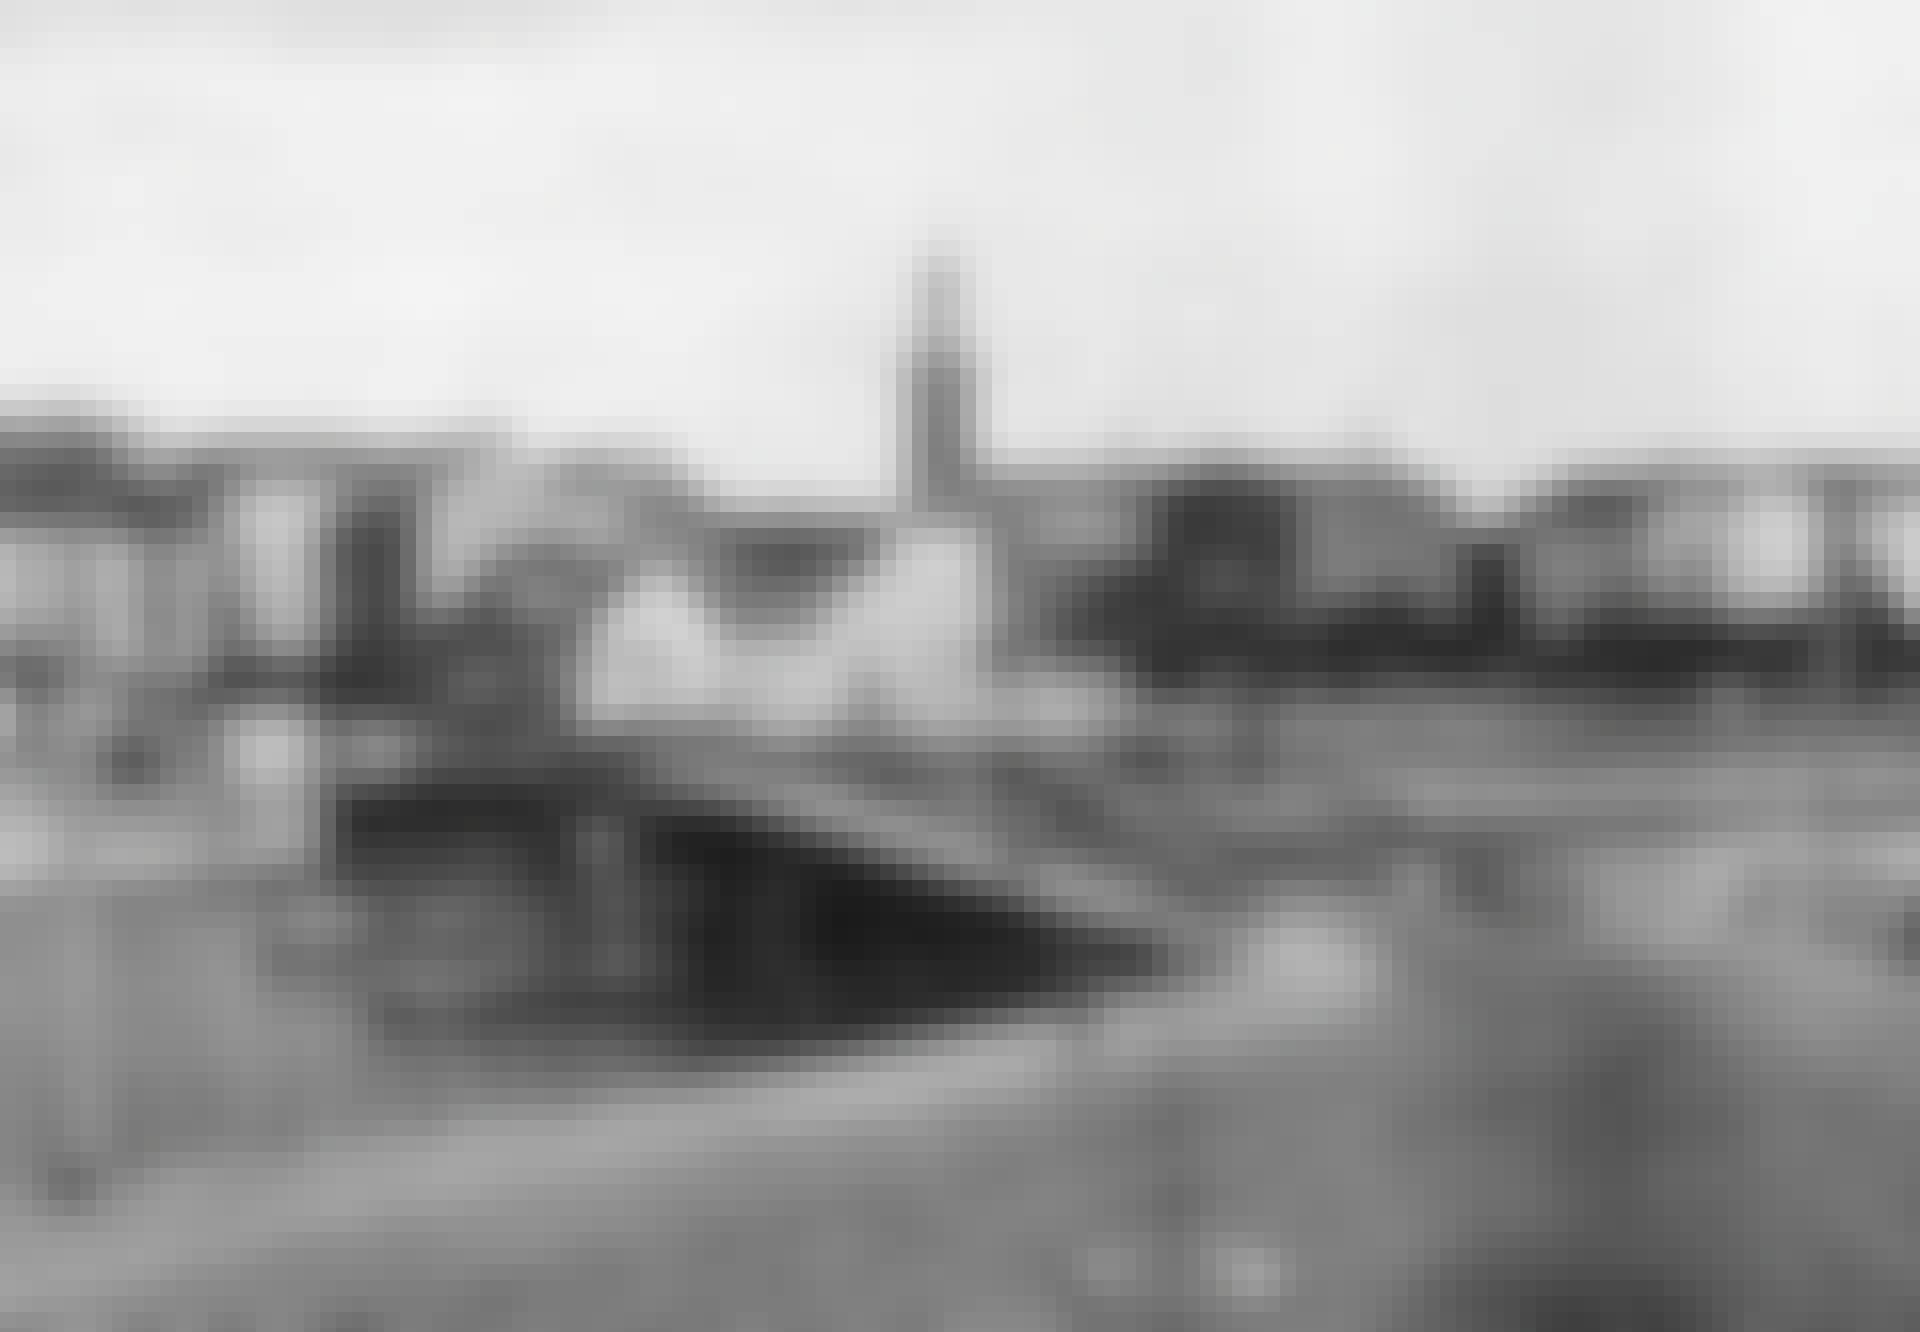 Charlottenbrucke flugt 2. verdenskrig